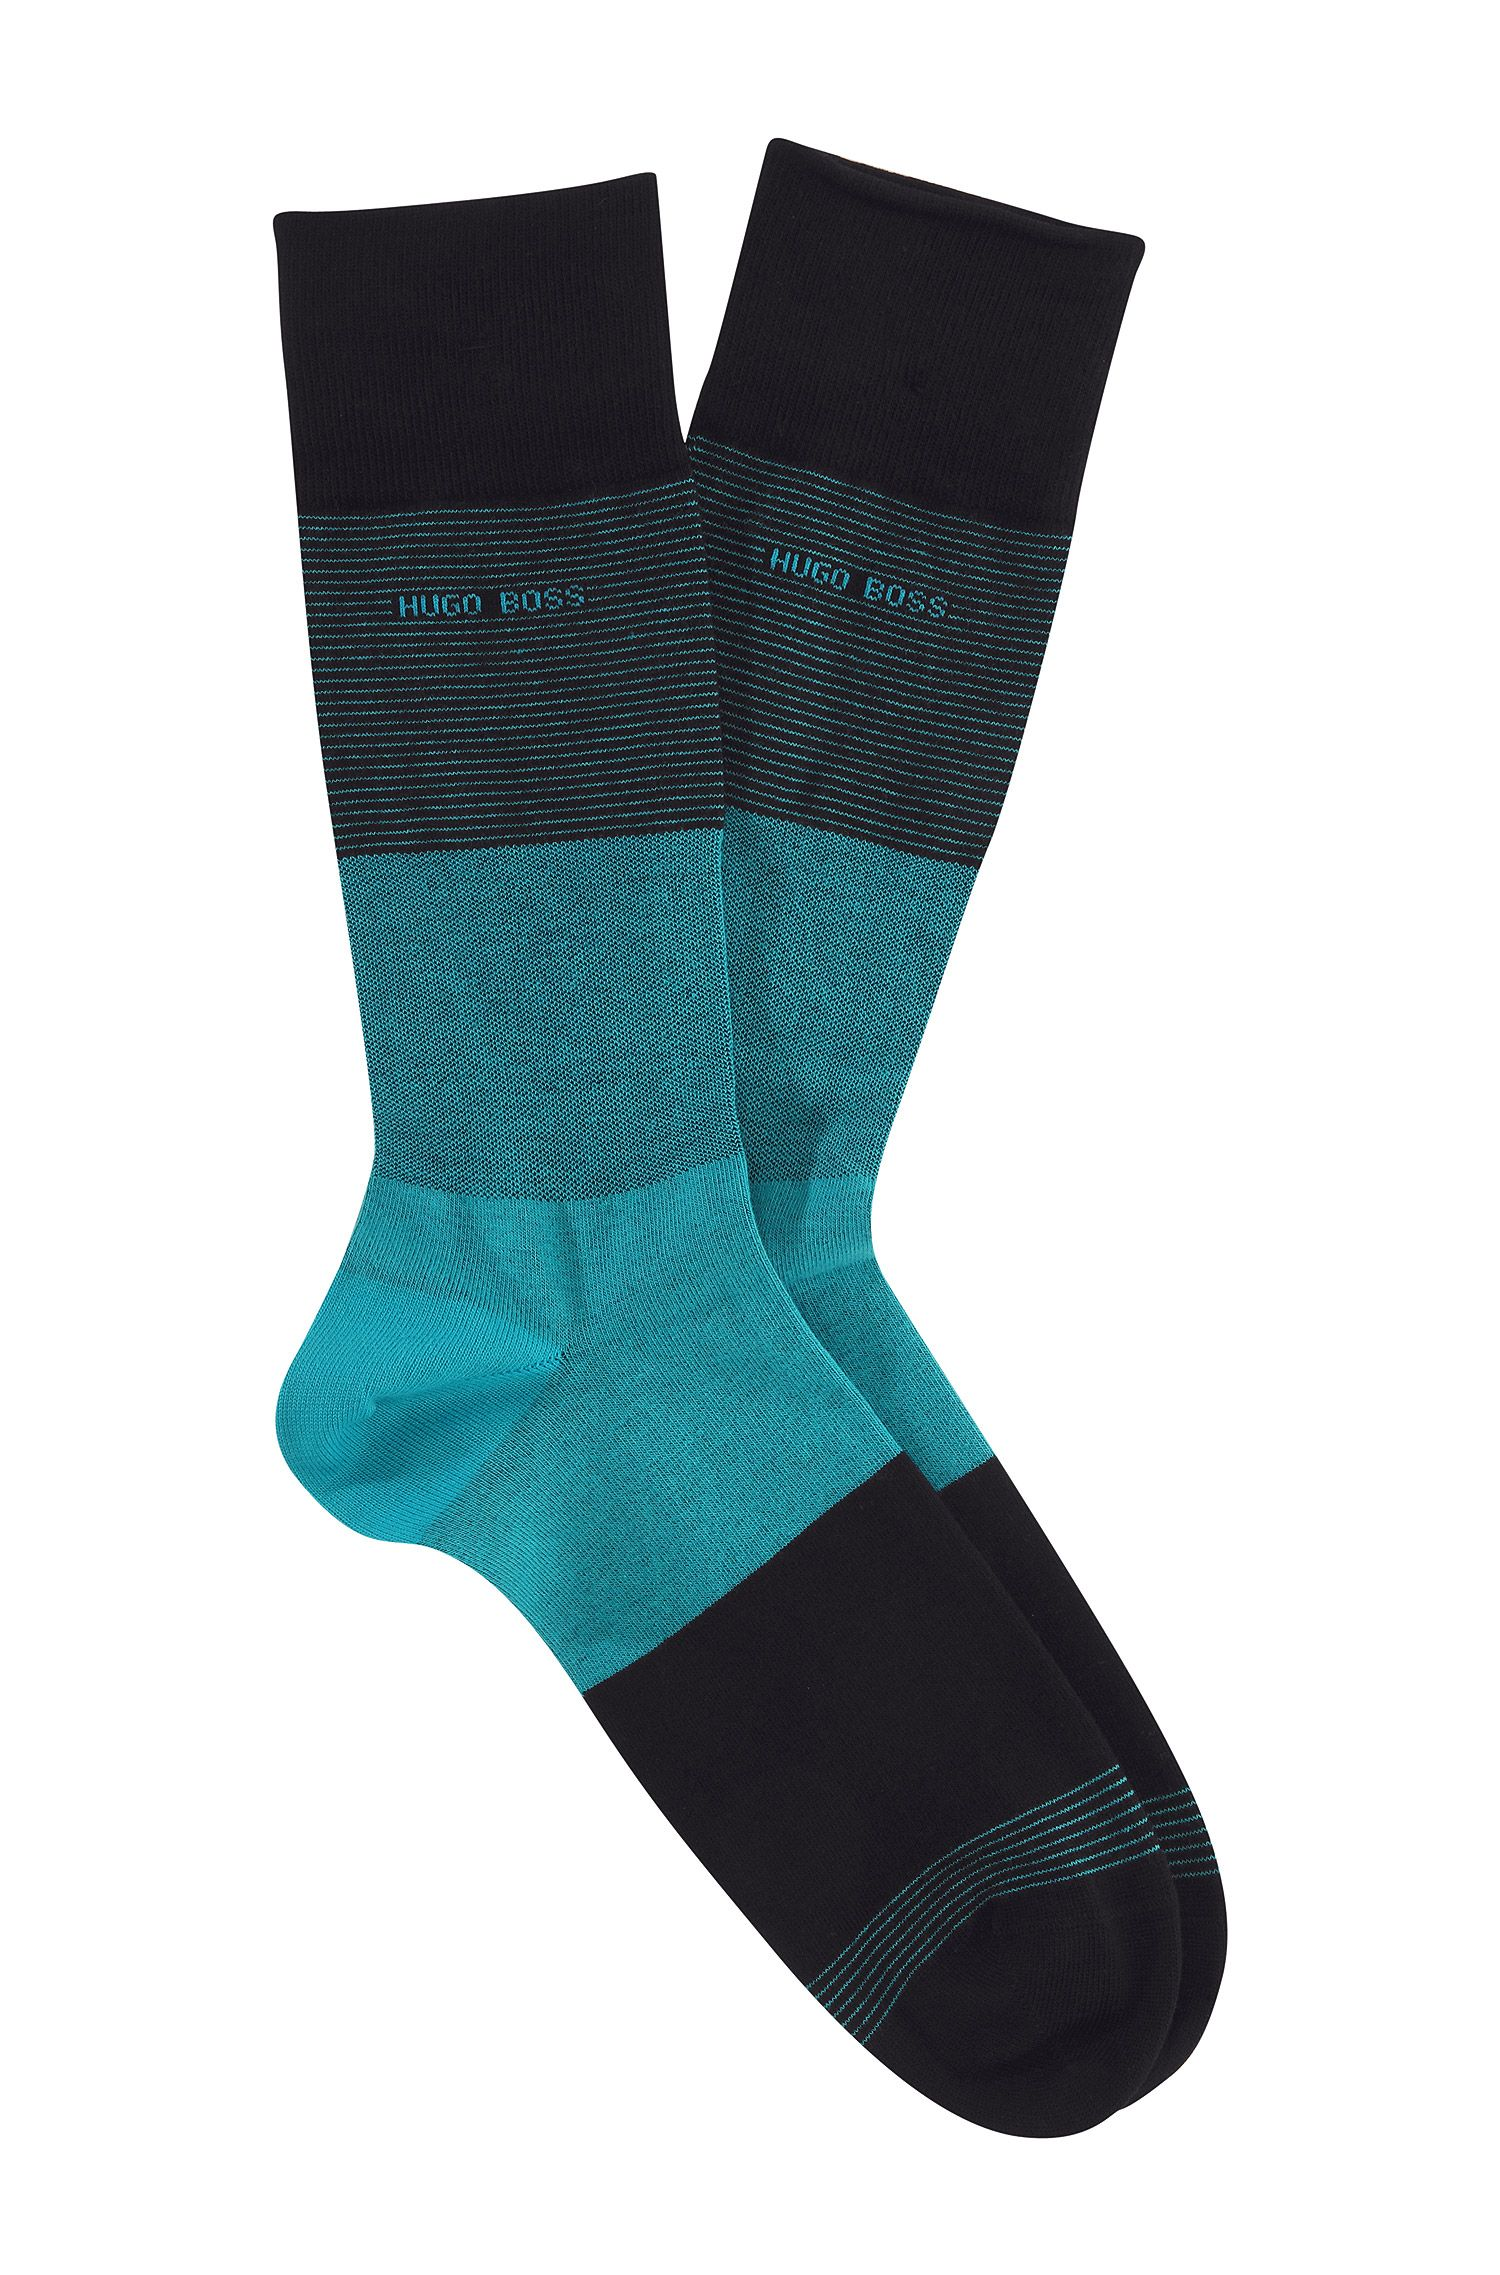 Chaussettes à larges rayures, RS Design